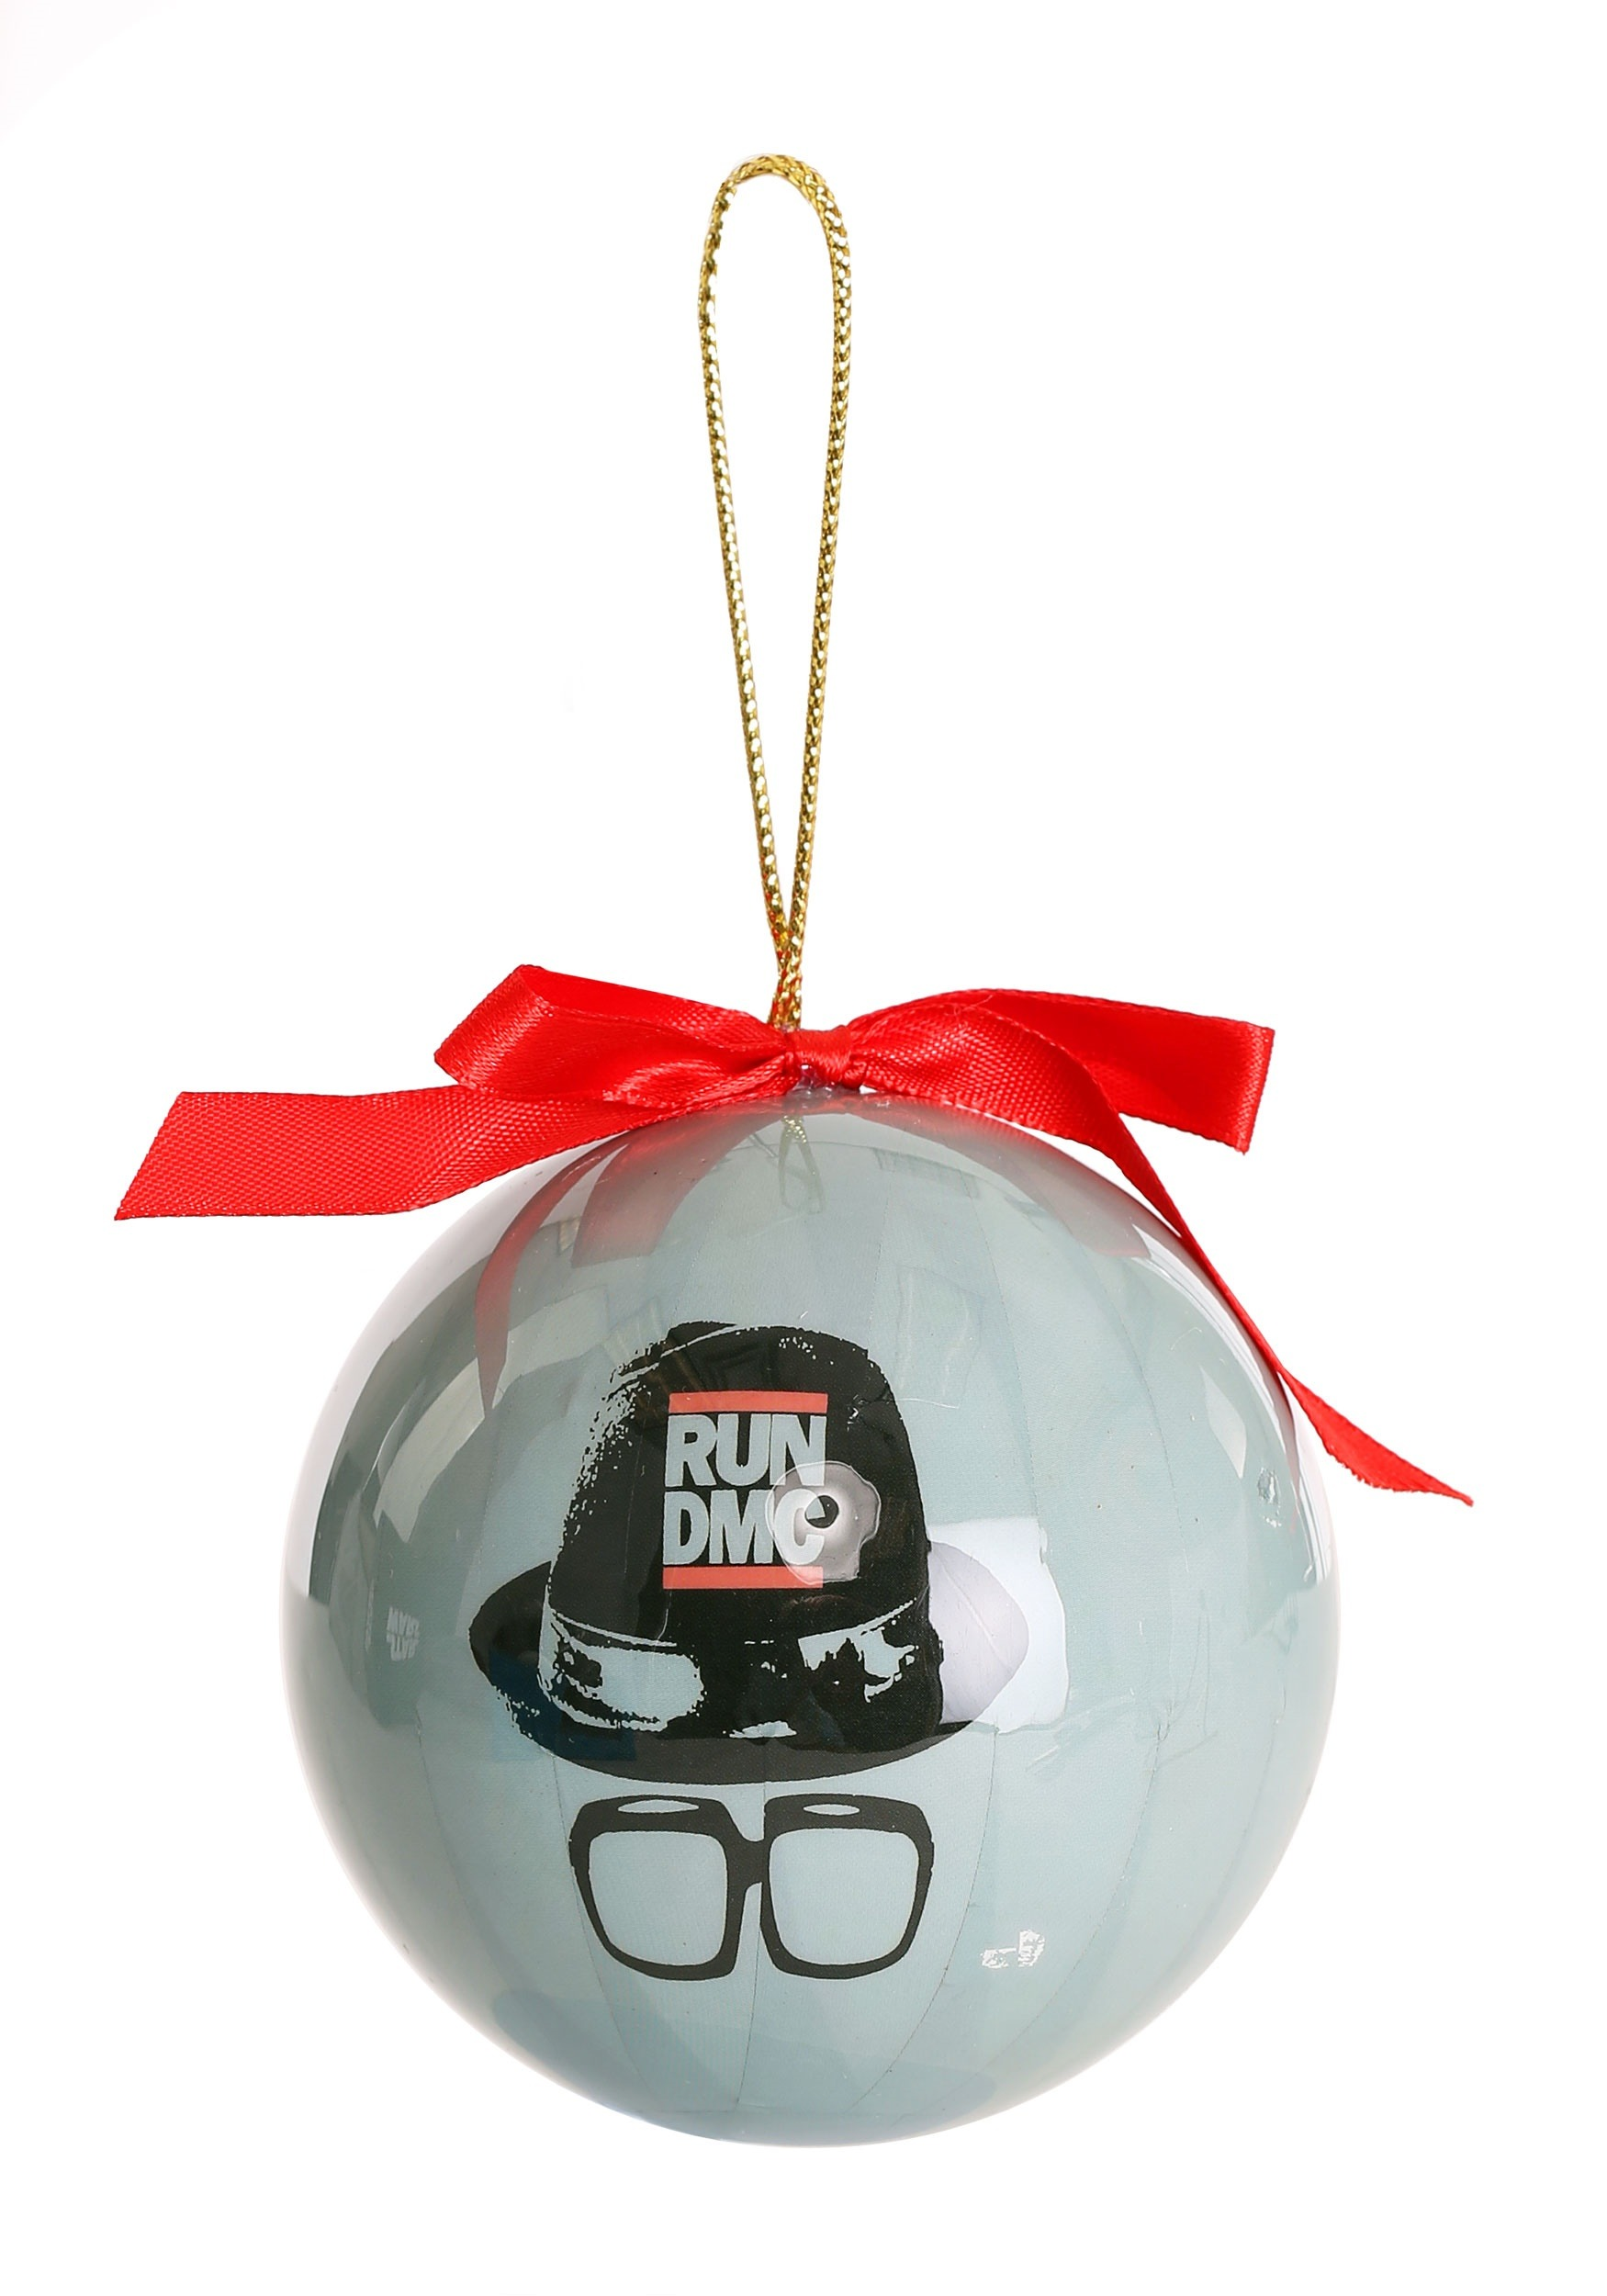 Run Dmc Christmas.Run Dmc Christmas Ornament